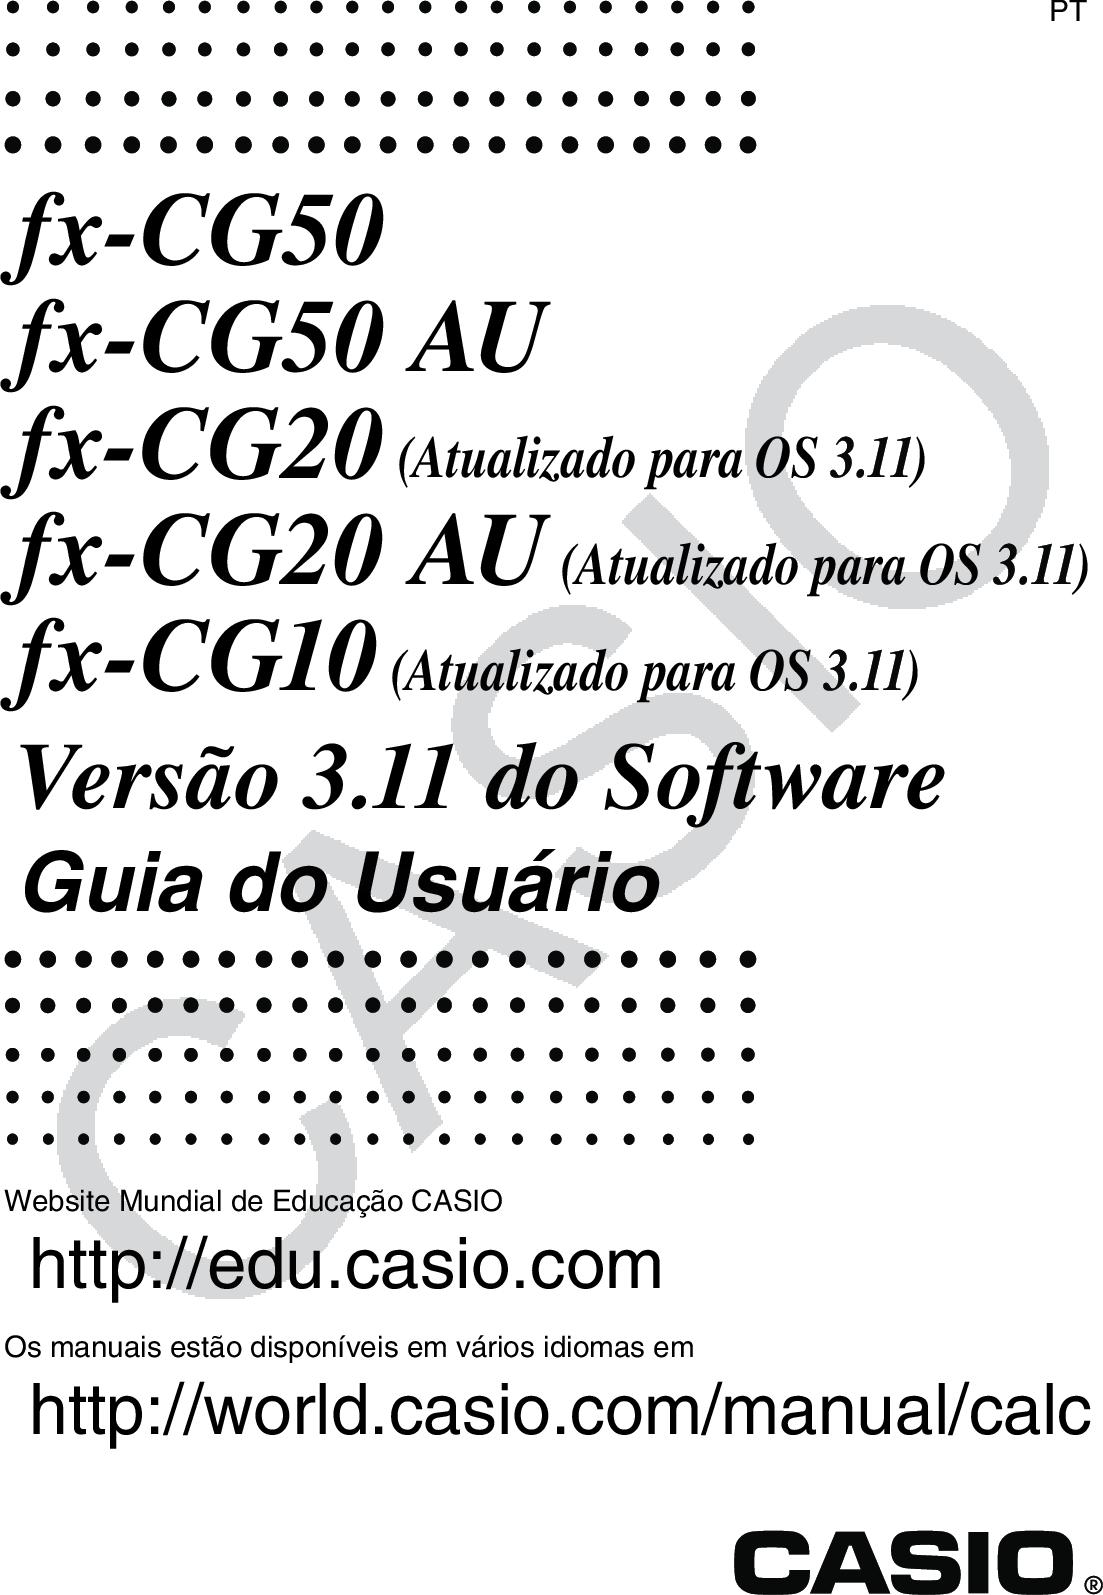 Casio Fx CG50_fx CG50 AU_fx CG20_fx CG20 CG10 CG50_Soft